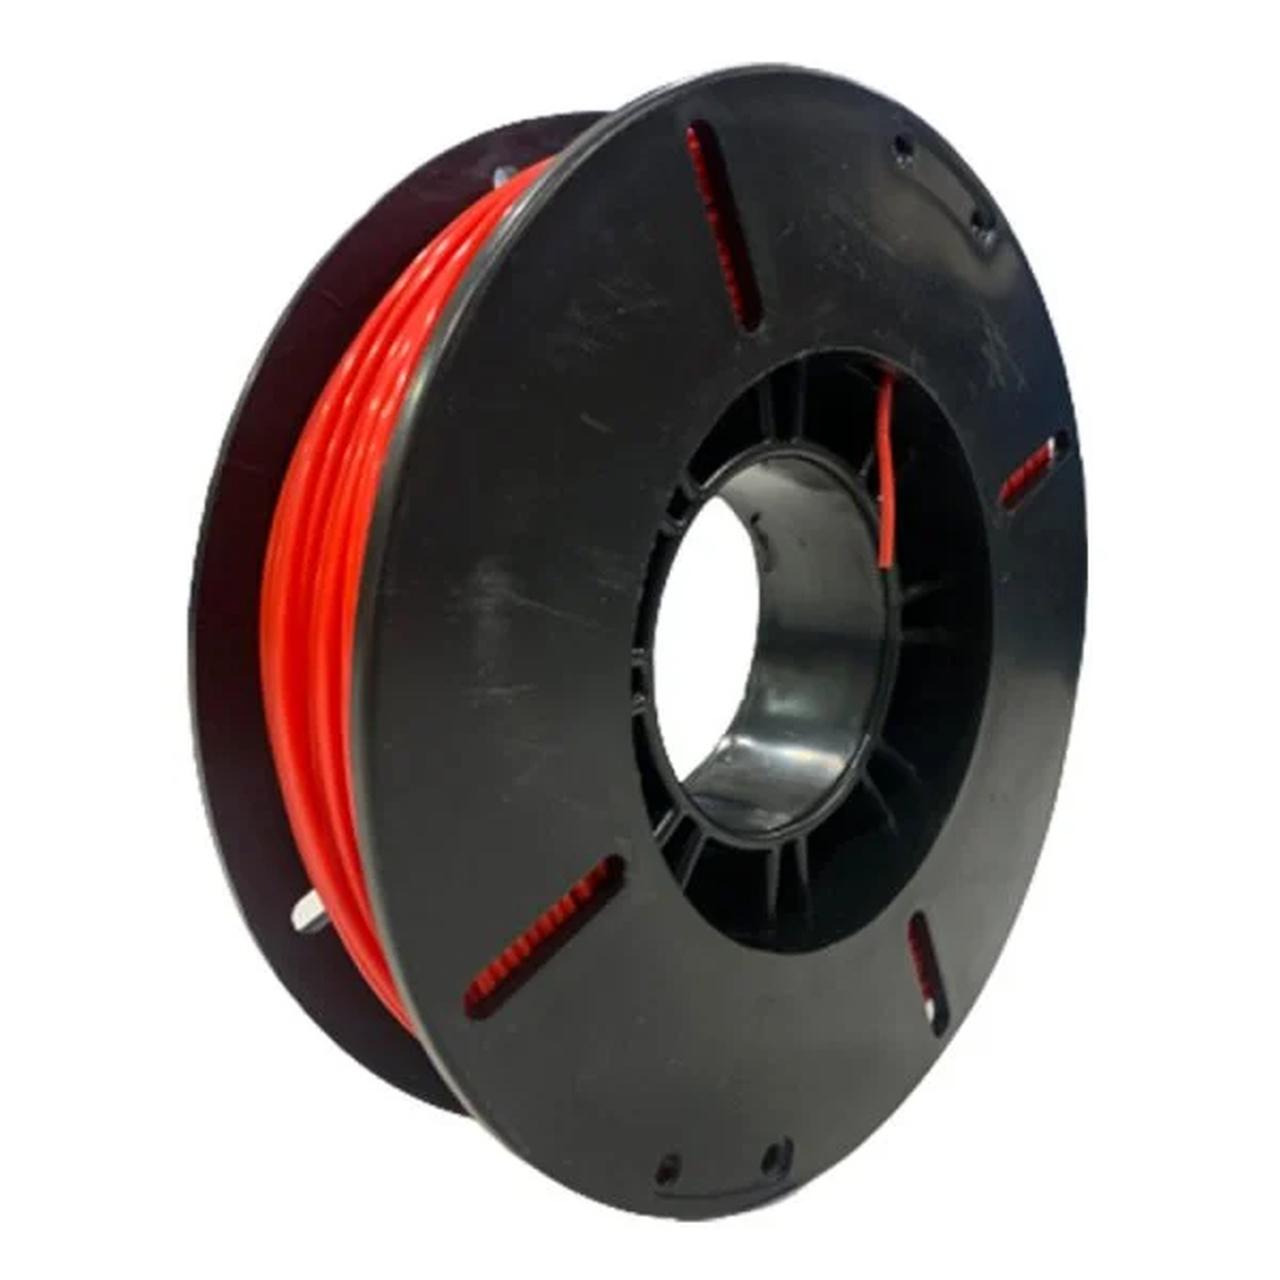 Filamento ABS Premium - Vermelho Ferrari - 3D Lab - 1.75mm - 200g